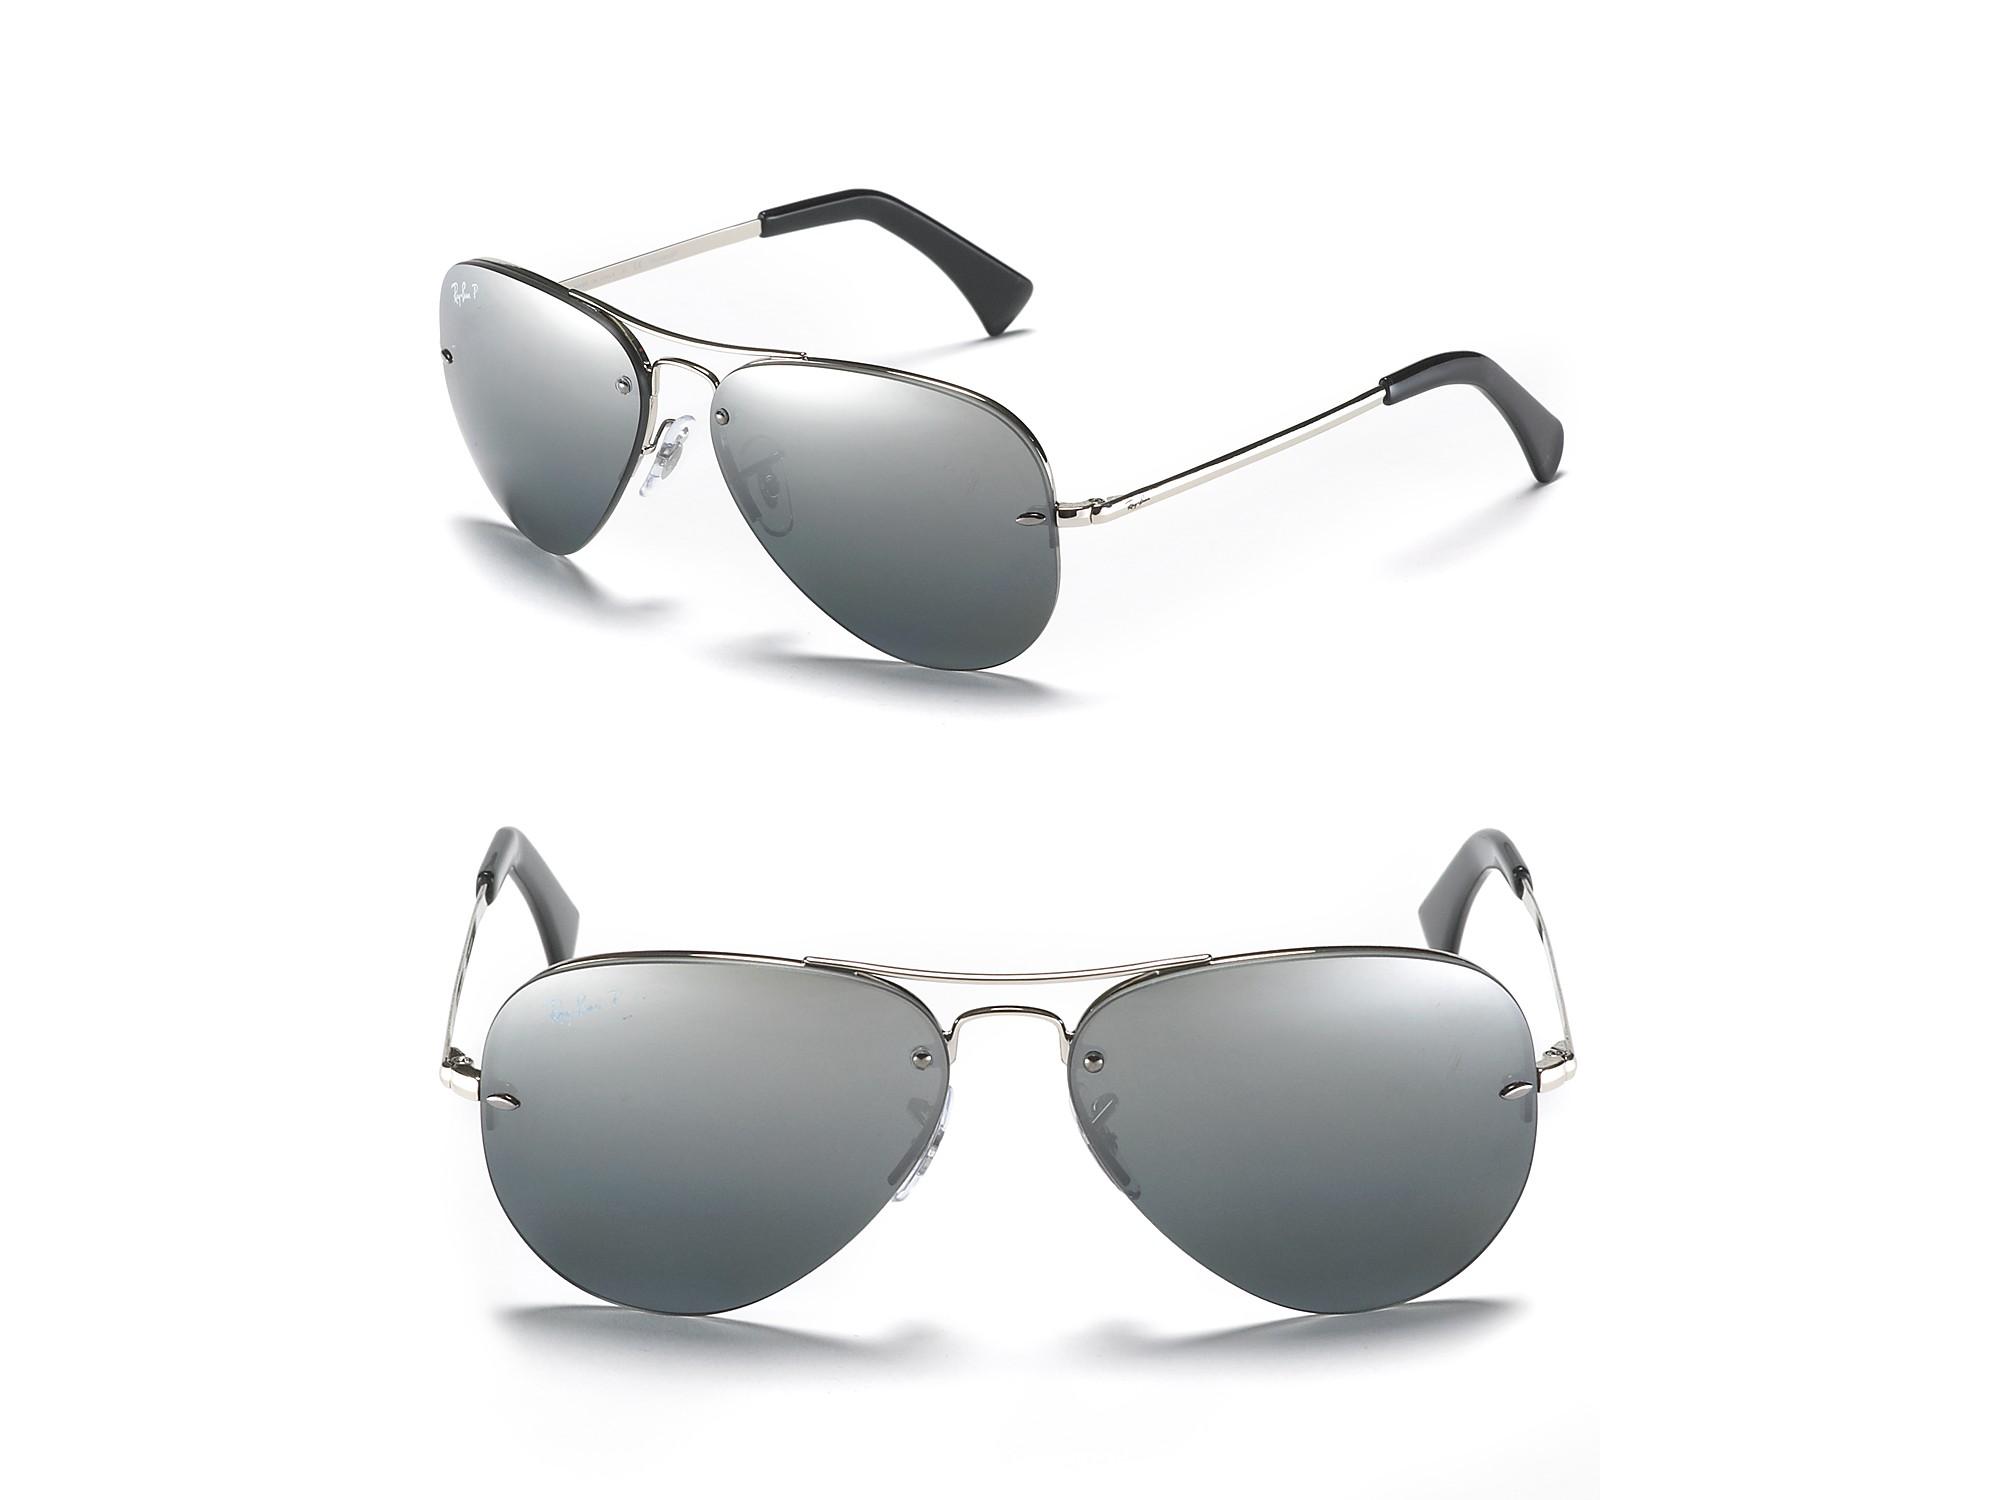 ray ban rimless small aviator sunglasses  ray ban silver large aviator sunglasses ray ban silver large aviator sunglasses